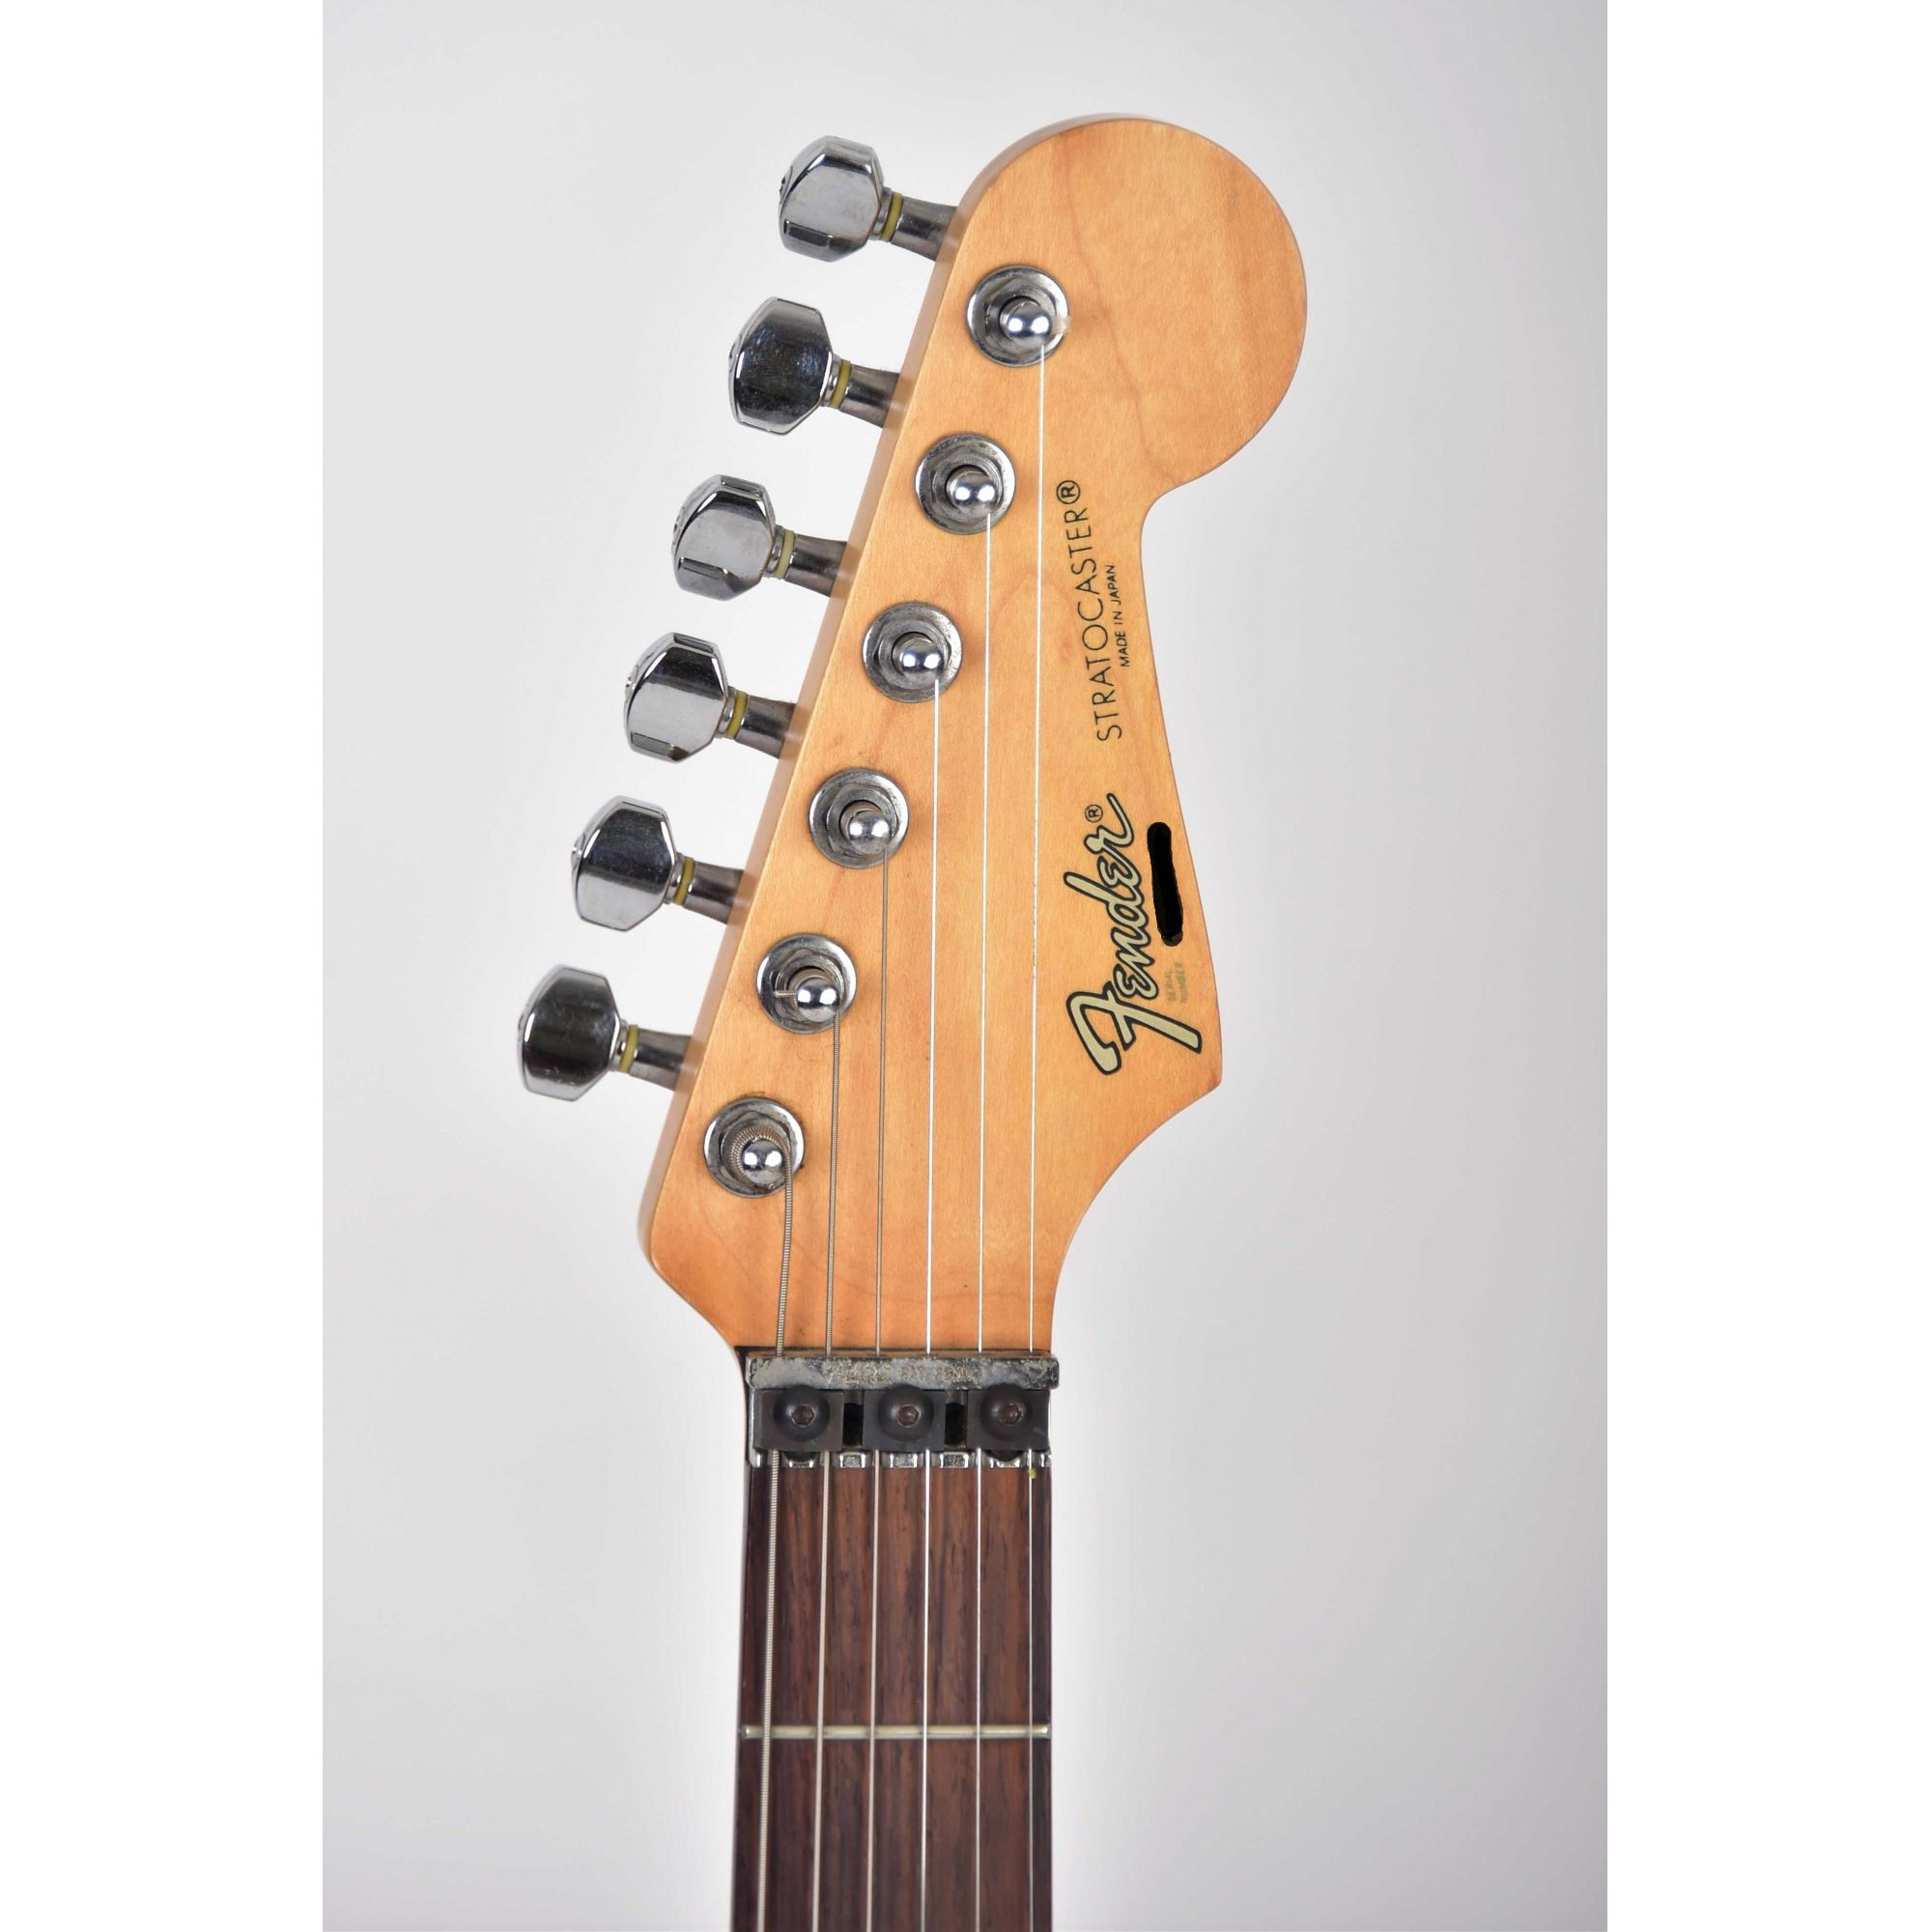 Fender Stratocaster Floyd Rose 1989 Made In Japan